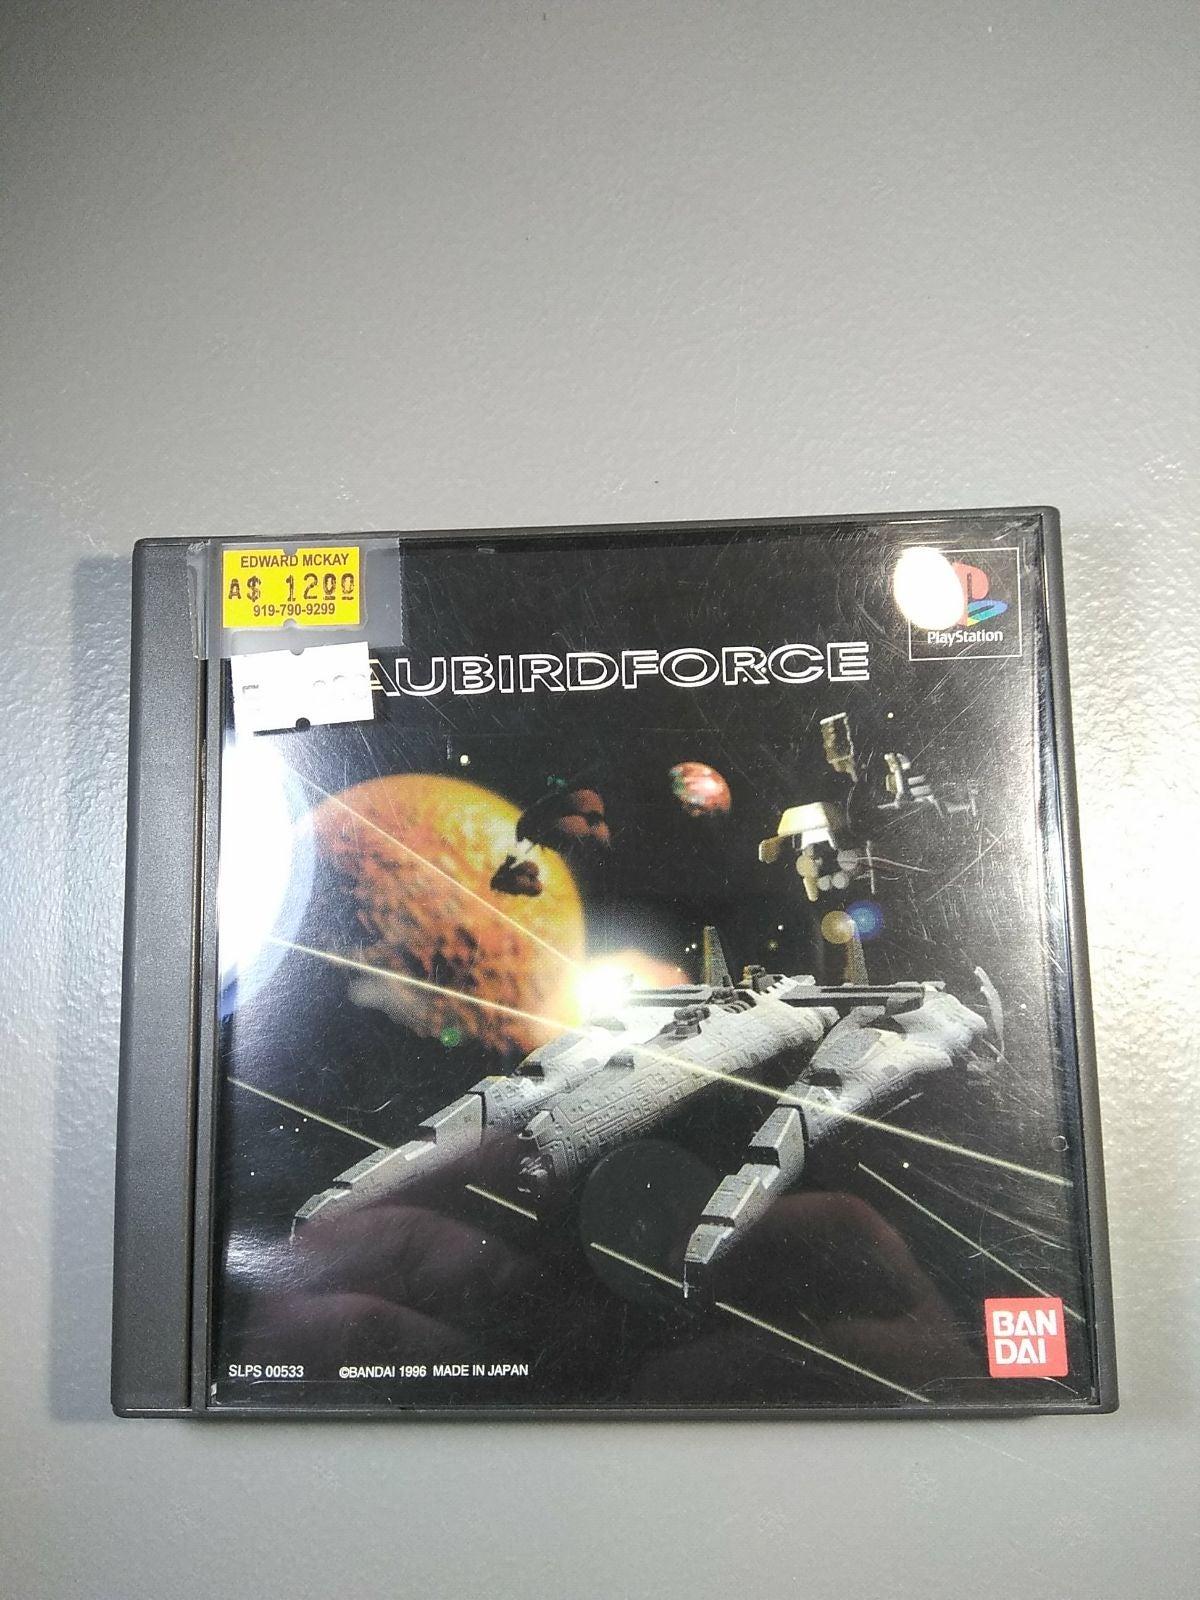 Aubird Force Playstation 1 Japan Import